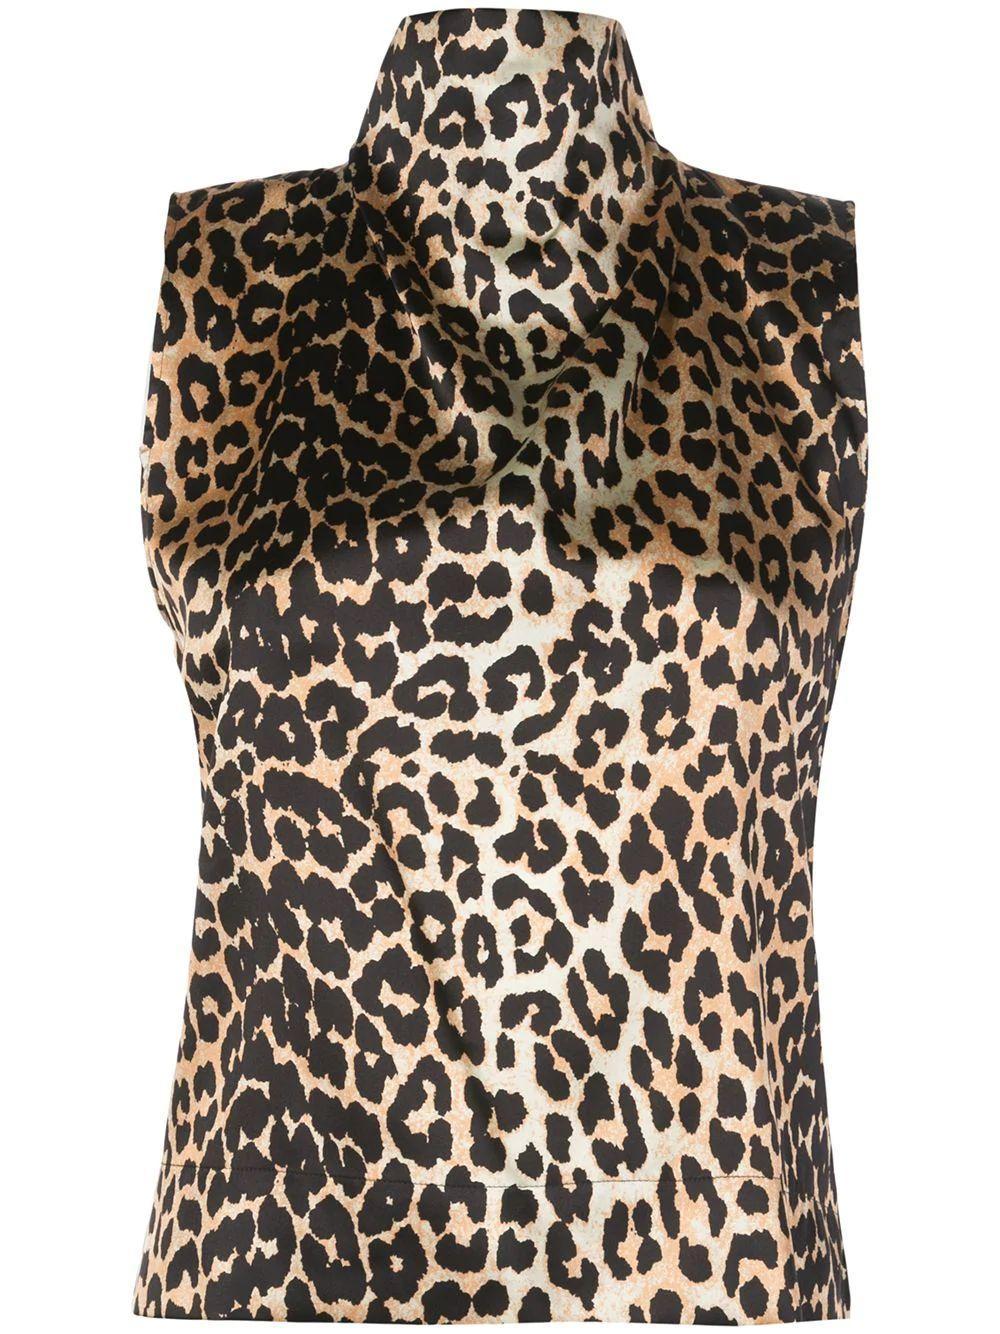 Leopard Sleeve Less Mock Neck Silk Satin Top Item # F4383